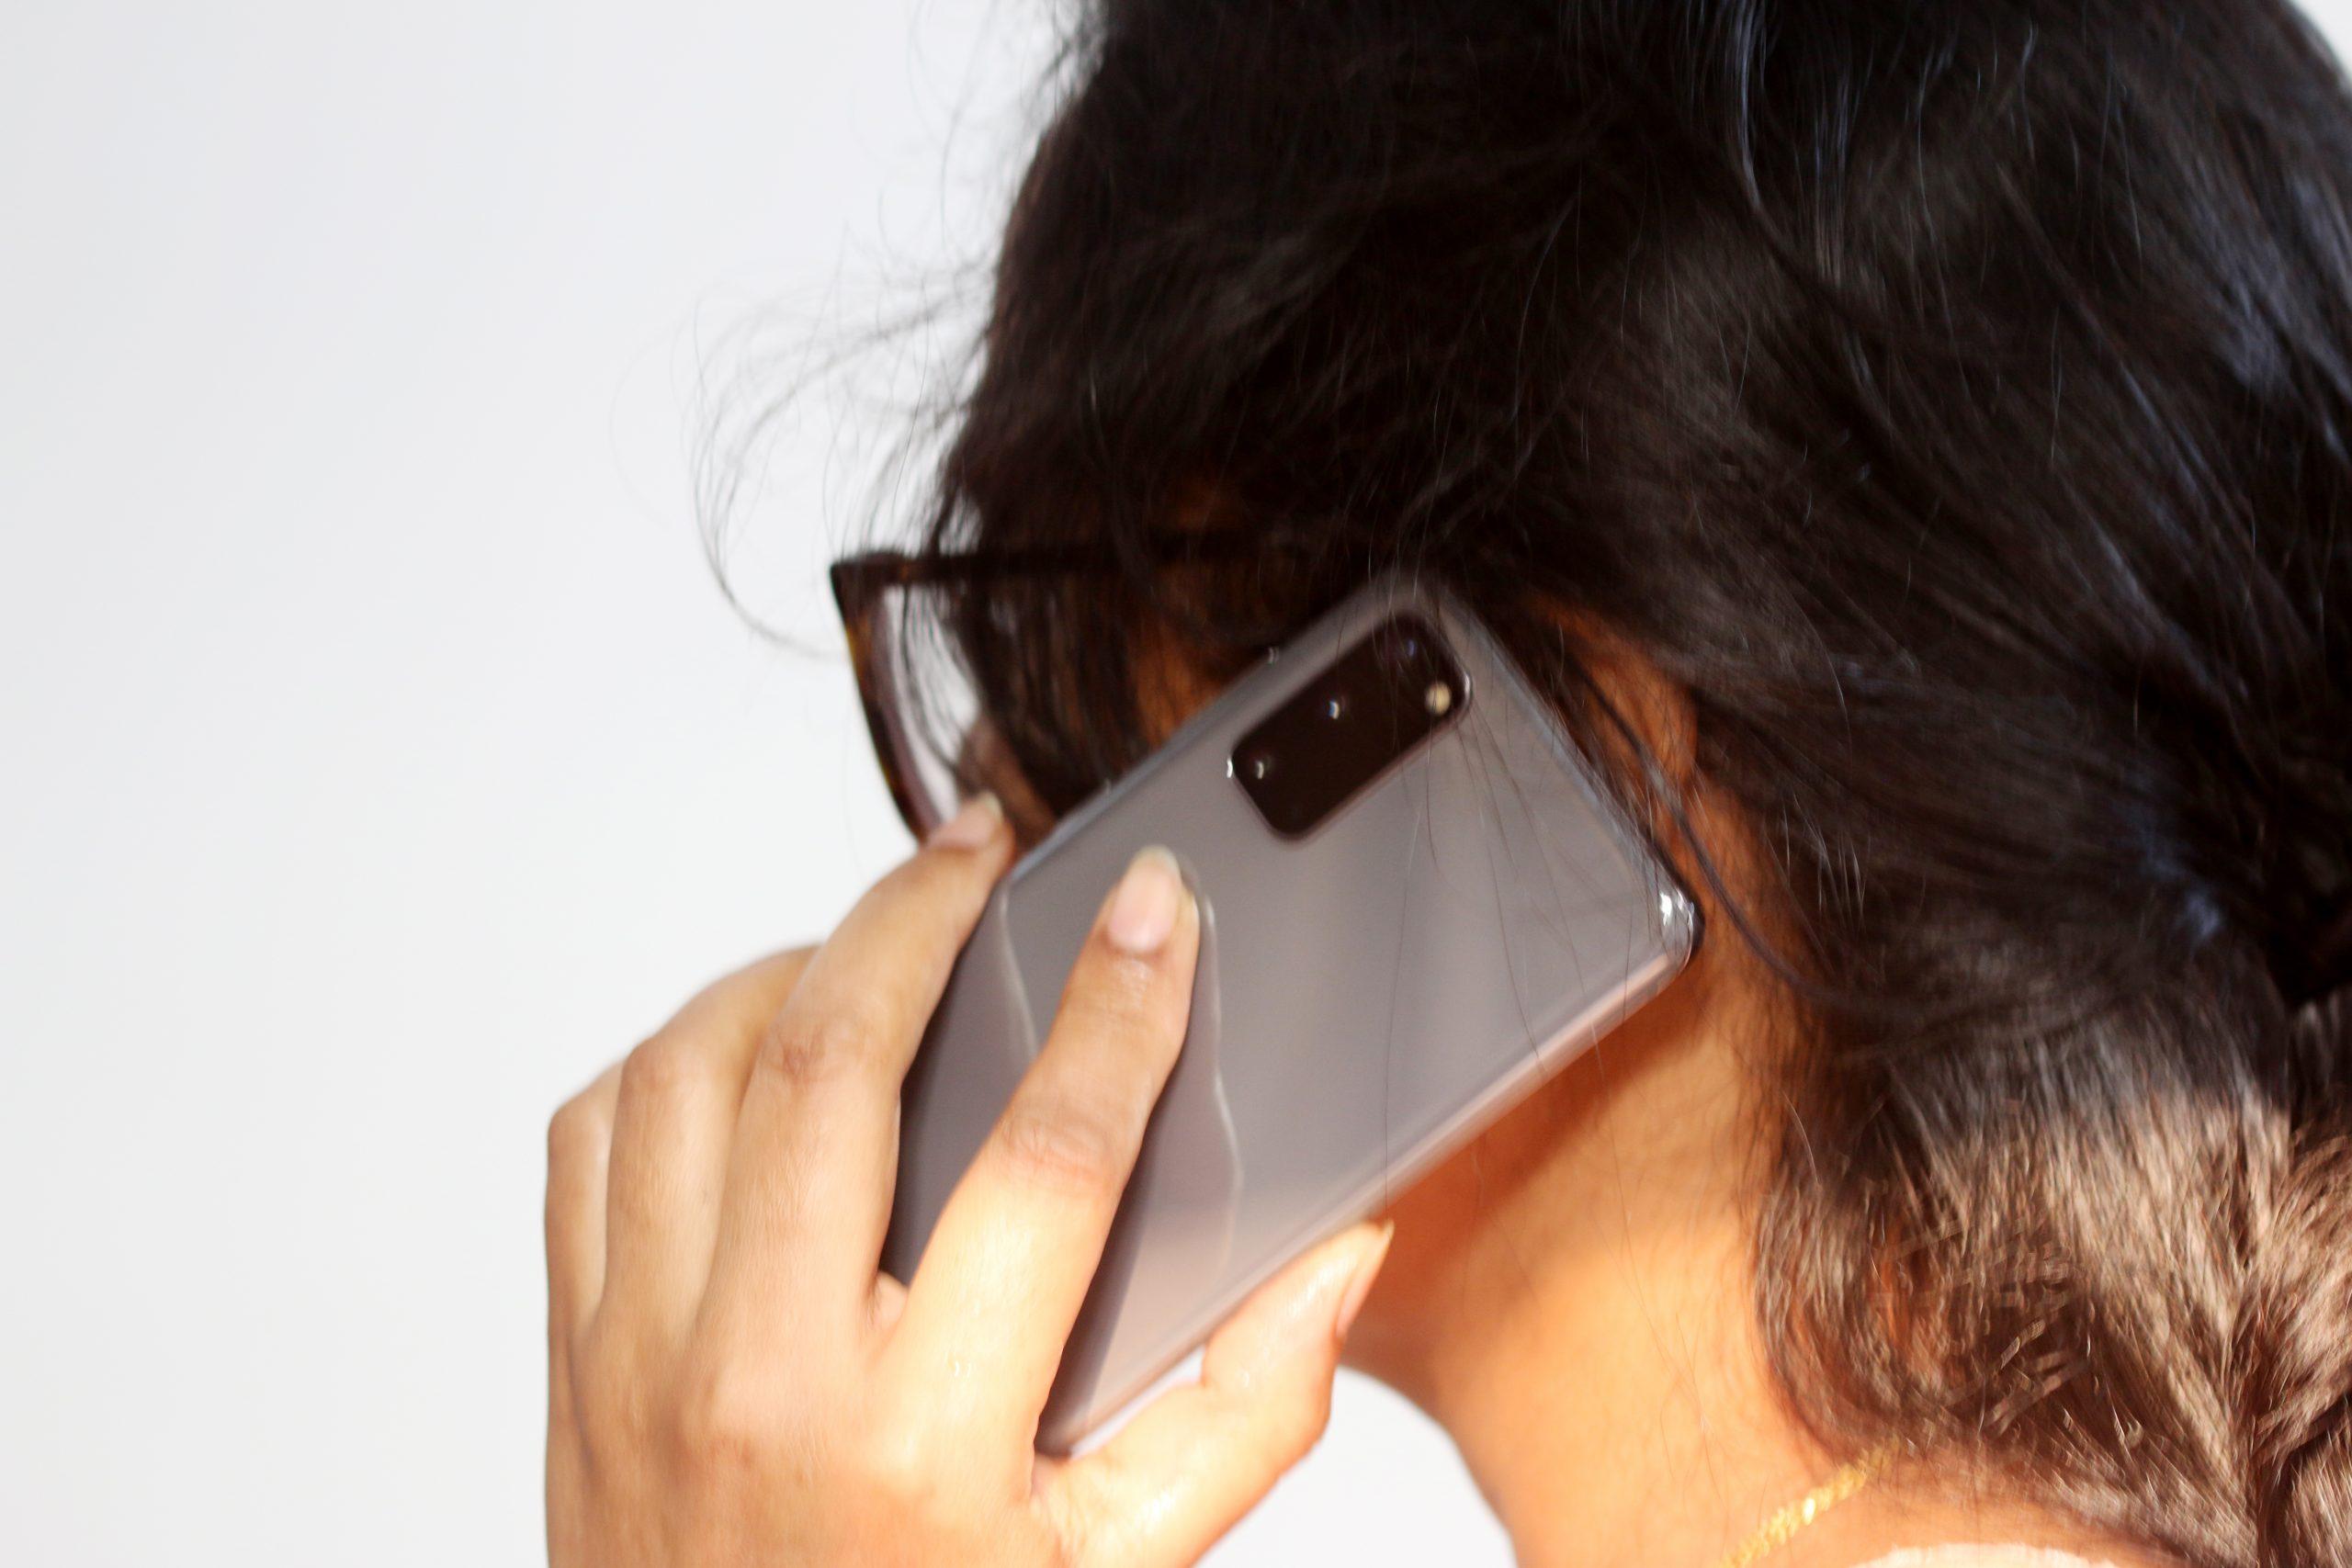 A girl on phone call